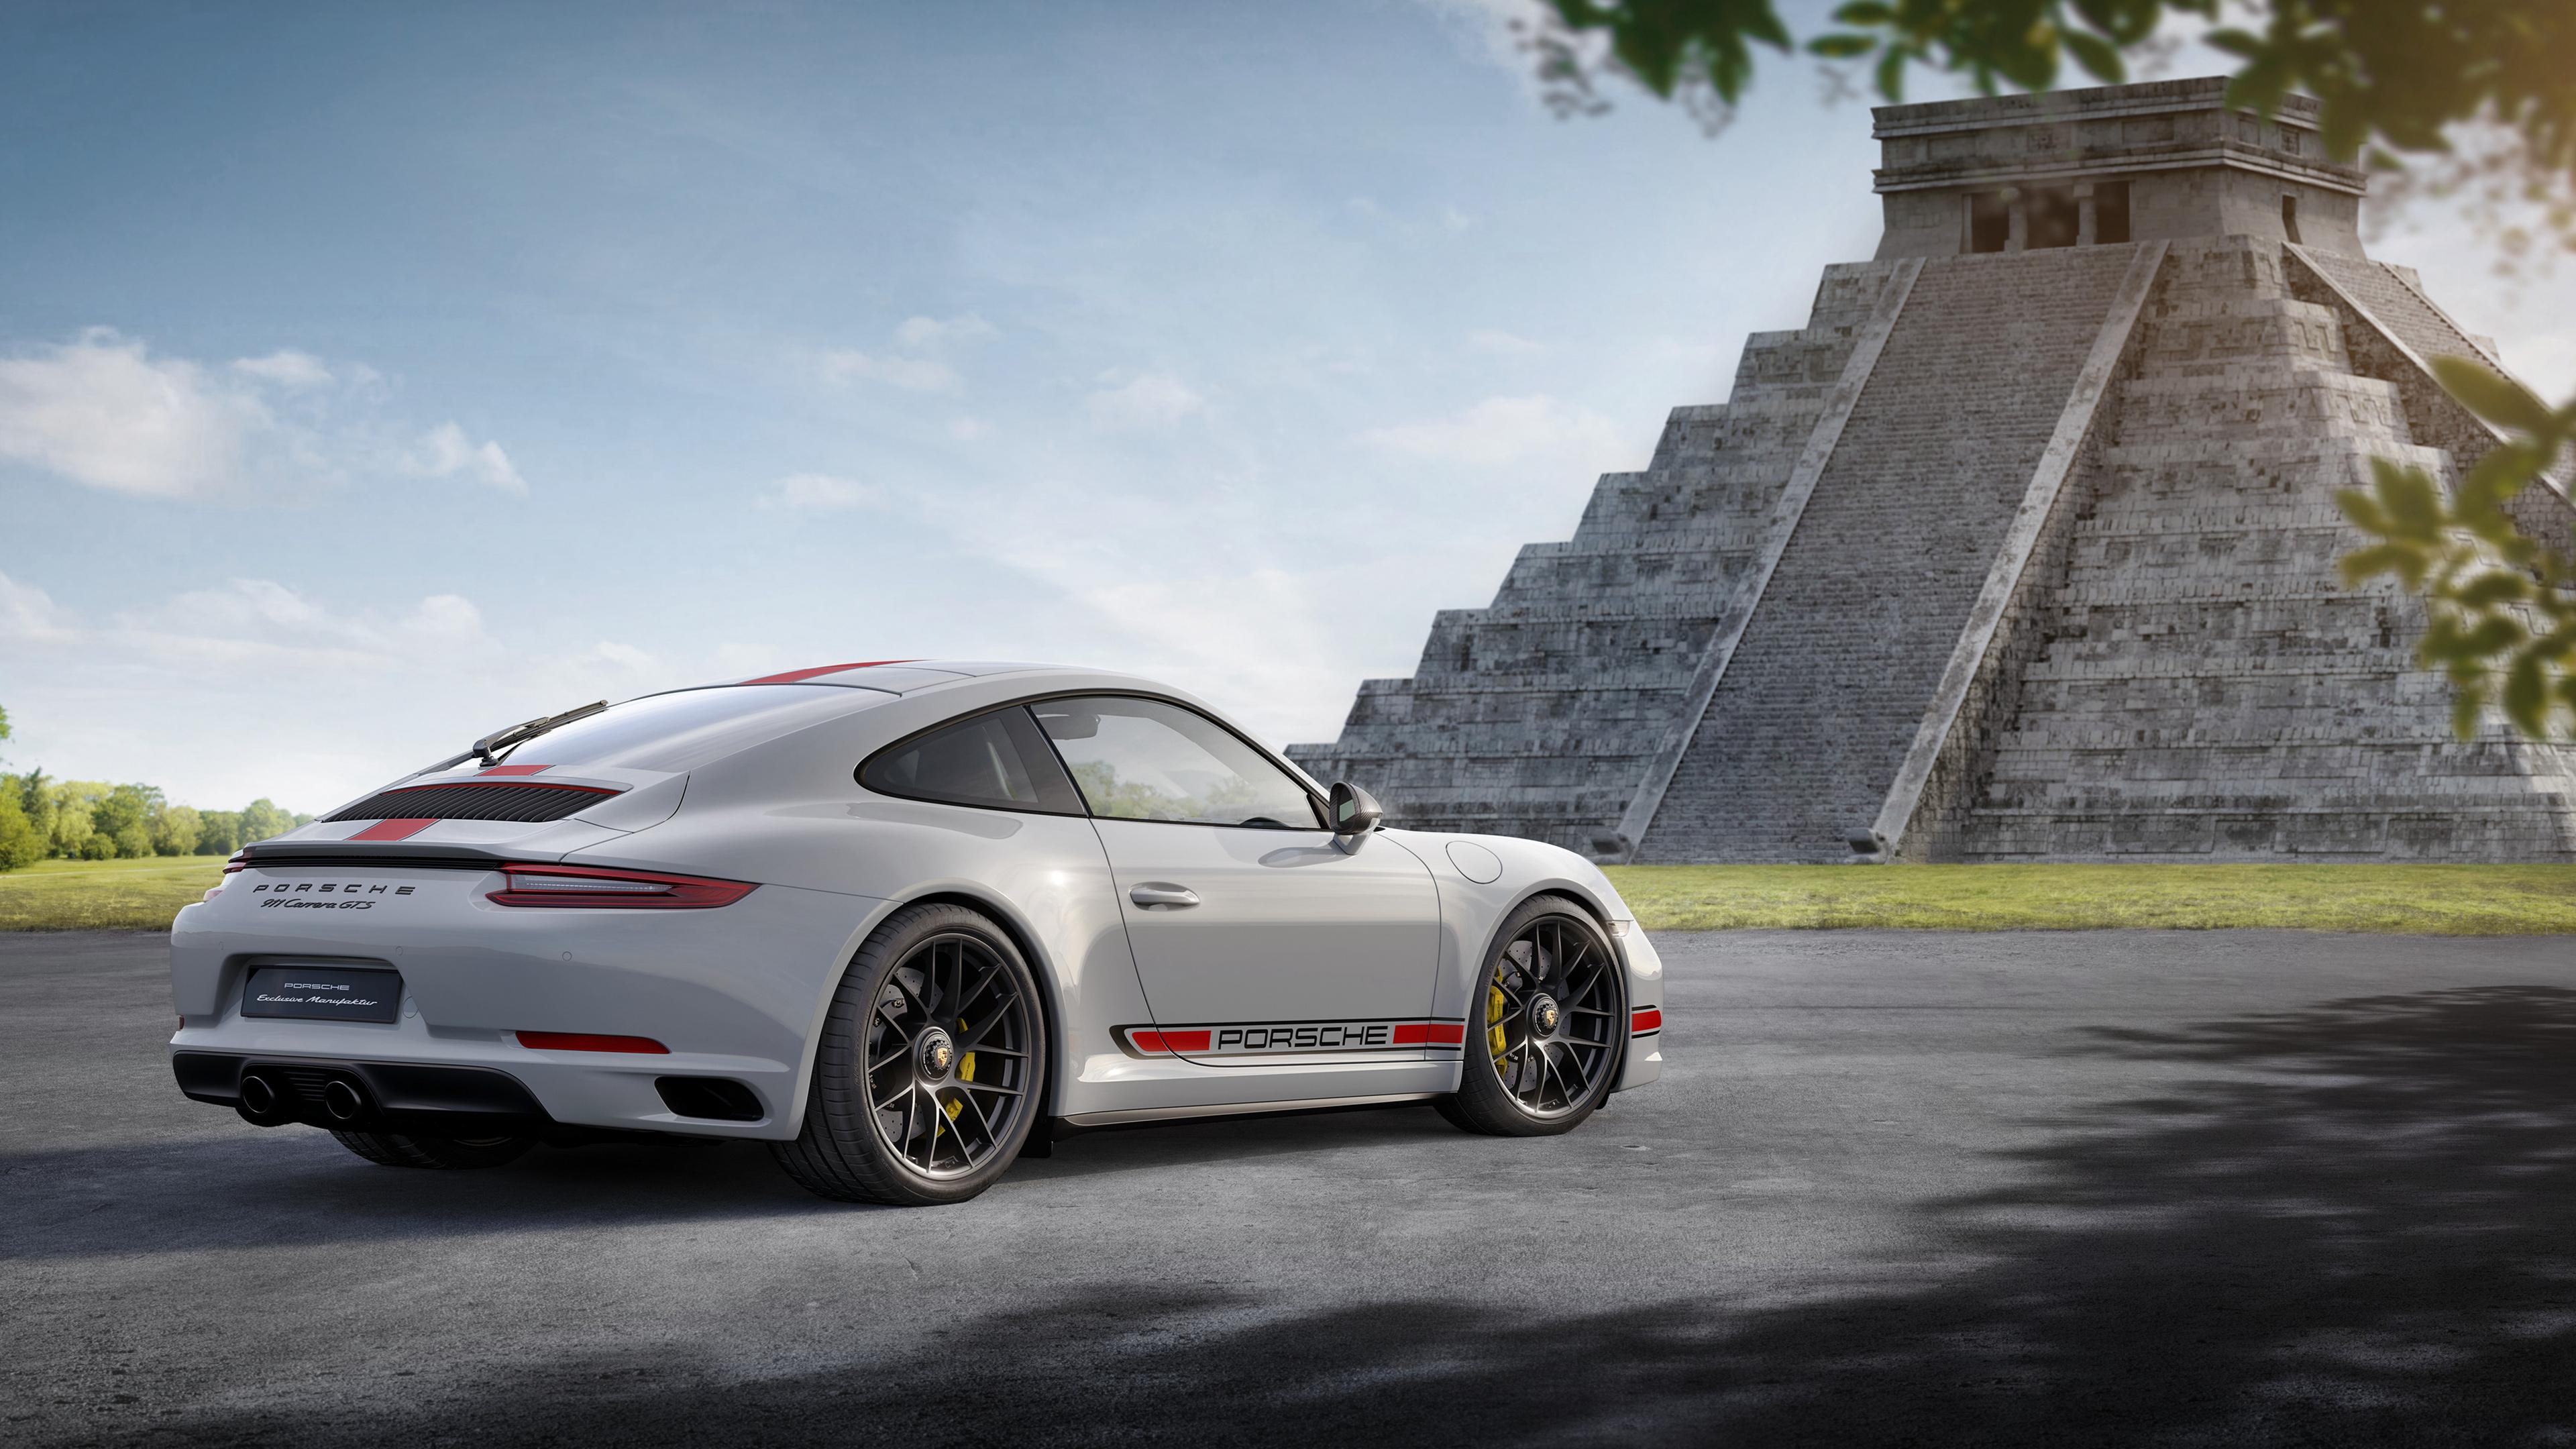 2017 Porsche 911 Carrera GTS Coupe 15